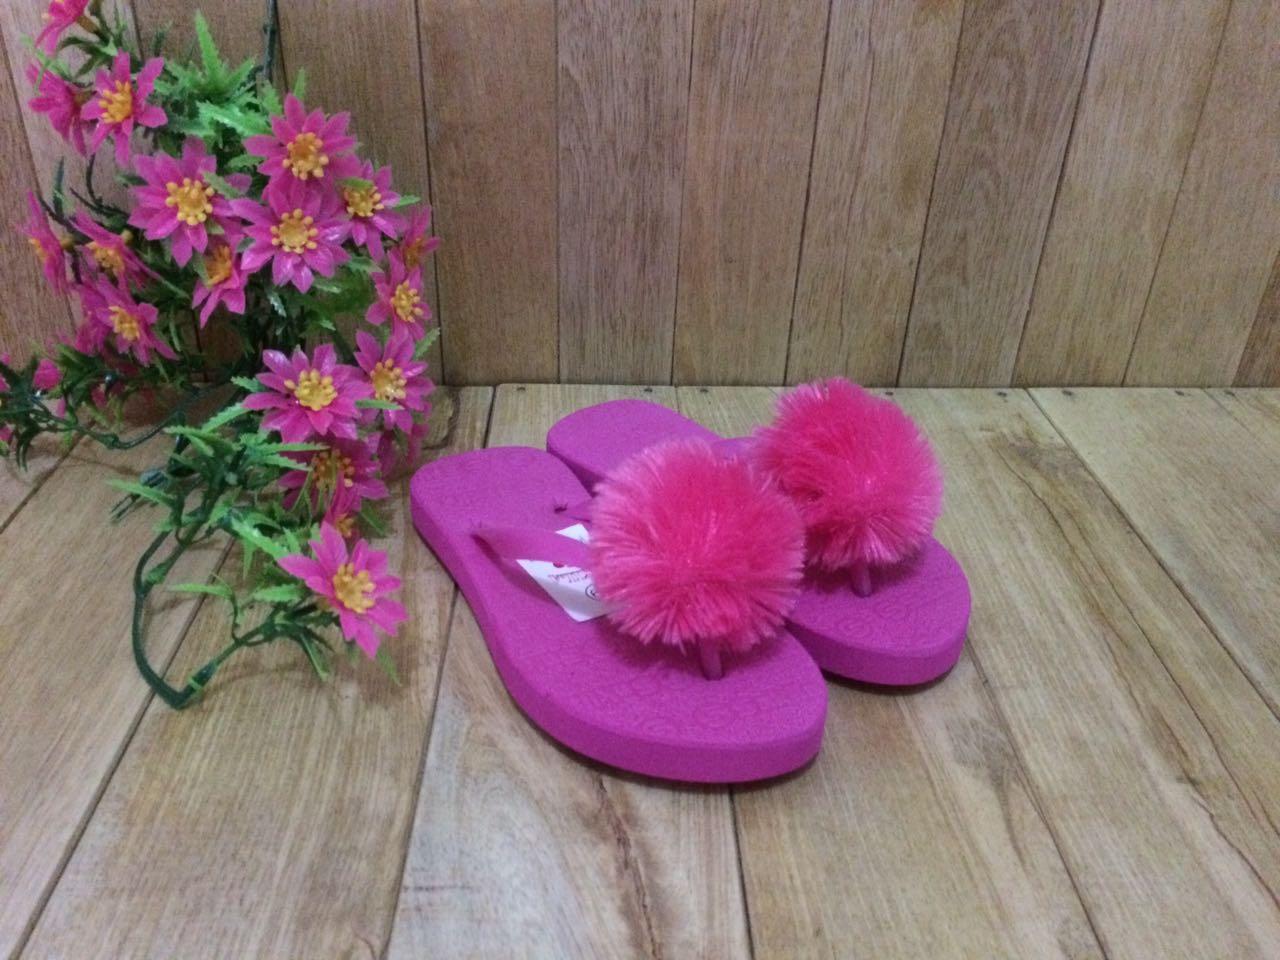 Sandal Pom-pom, Jual Sandal Pom-pom Murah   Dyiana Rouse